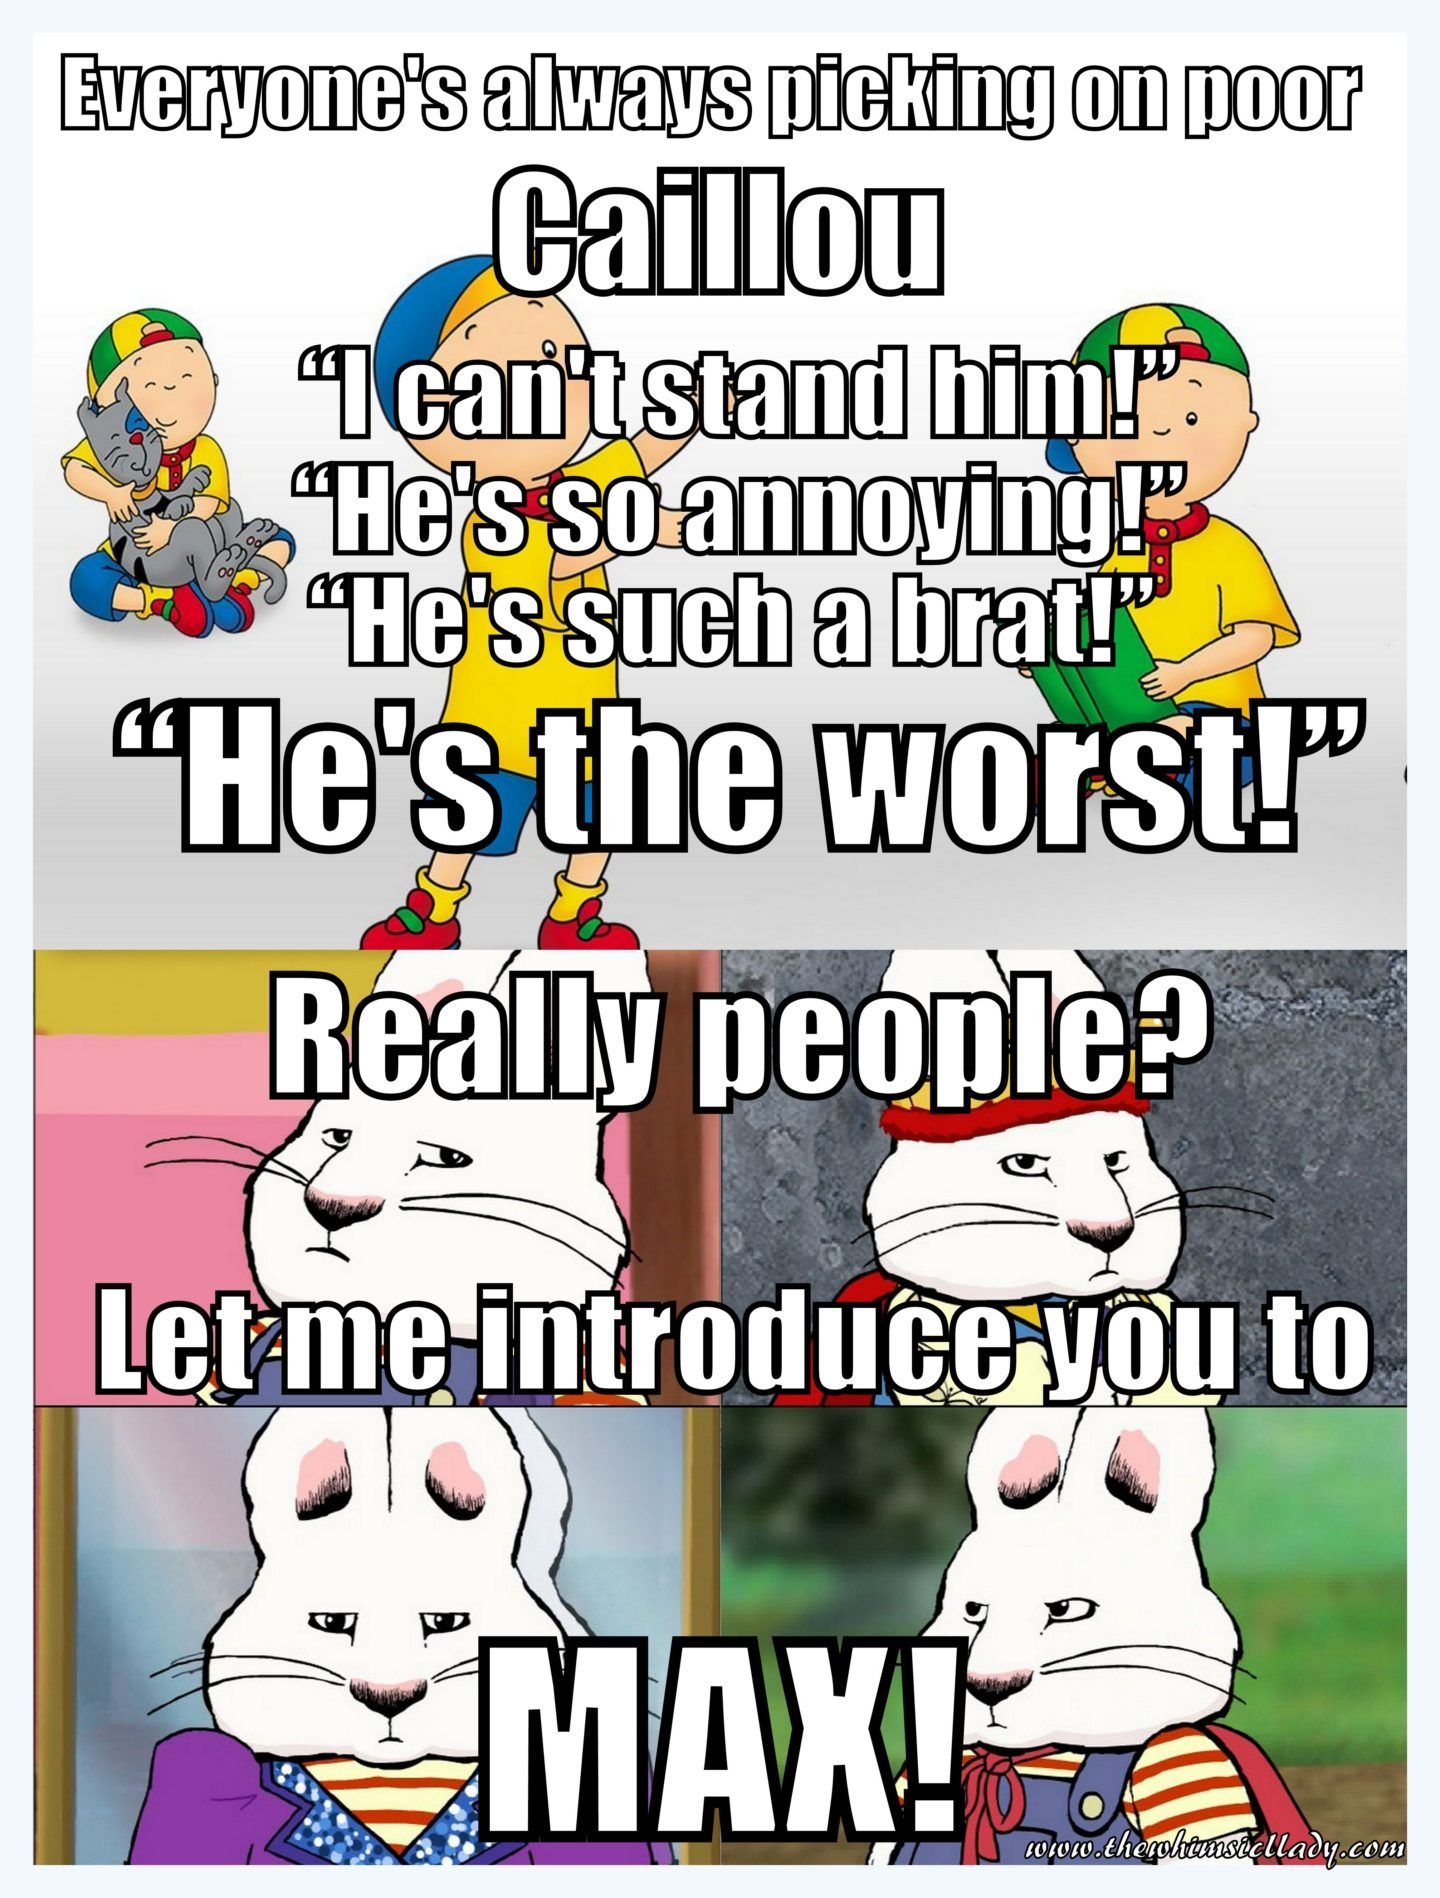 Funny Caillou Meme My Warped Sense Of Humor Really